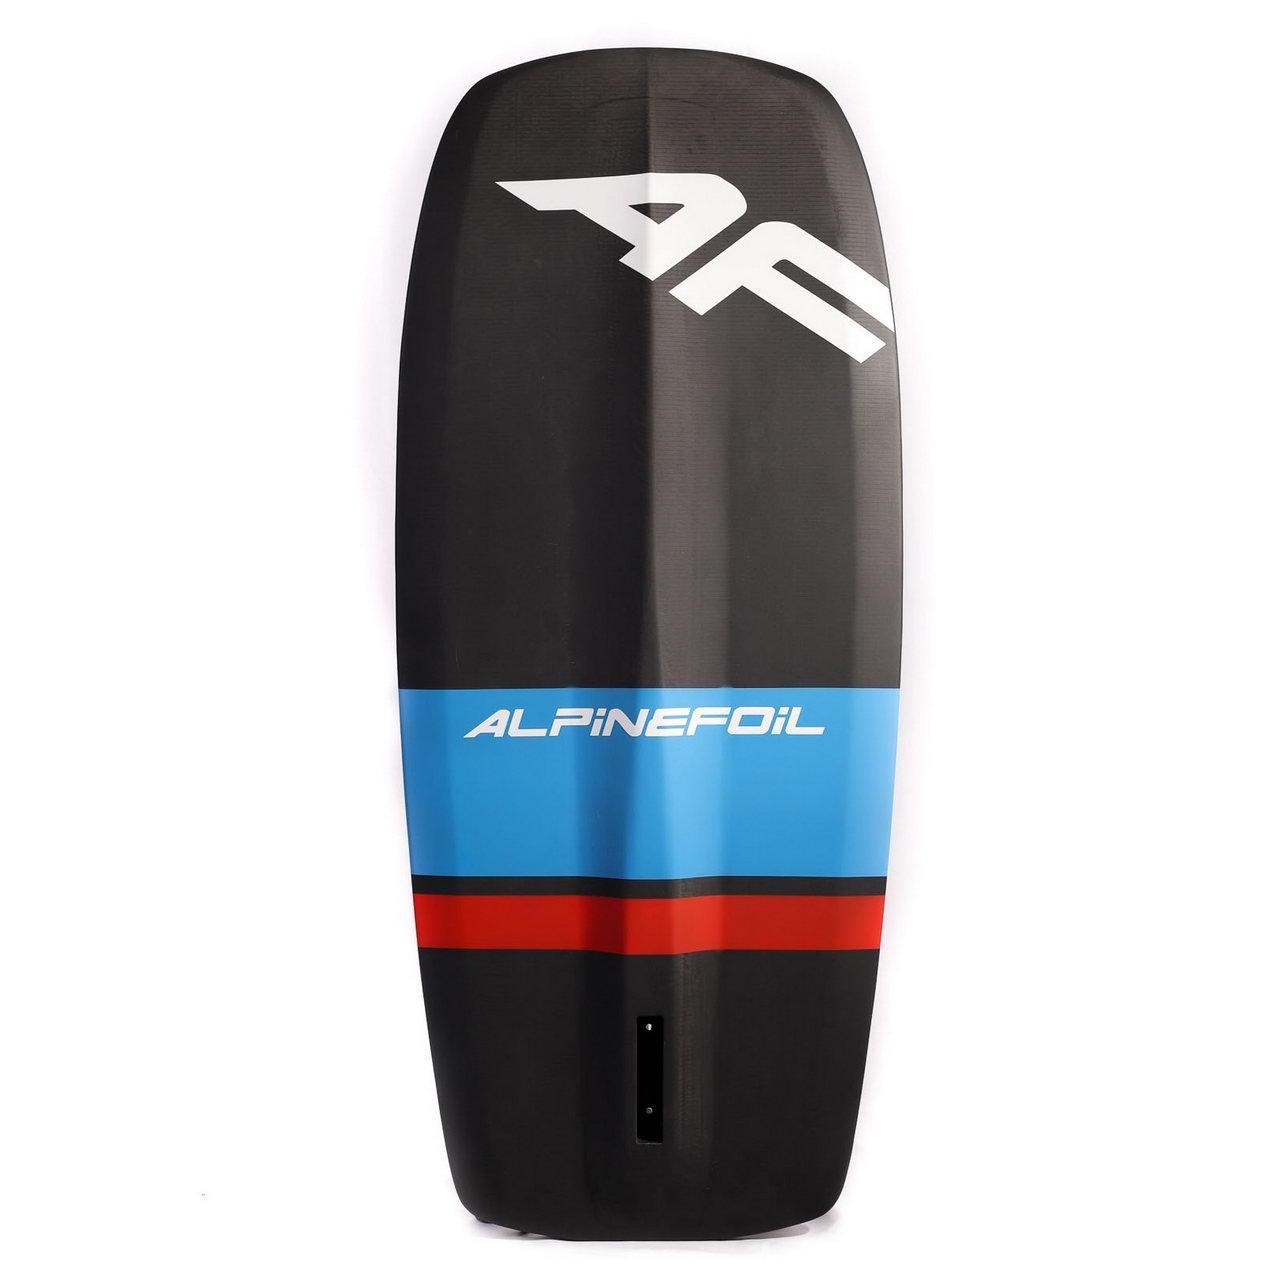 Alpinefoil pocket pro carbon 112x47 3296 1 1 redimensionner